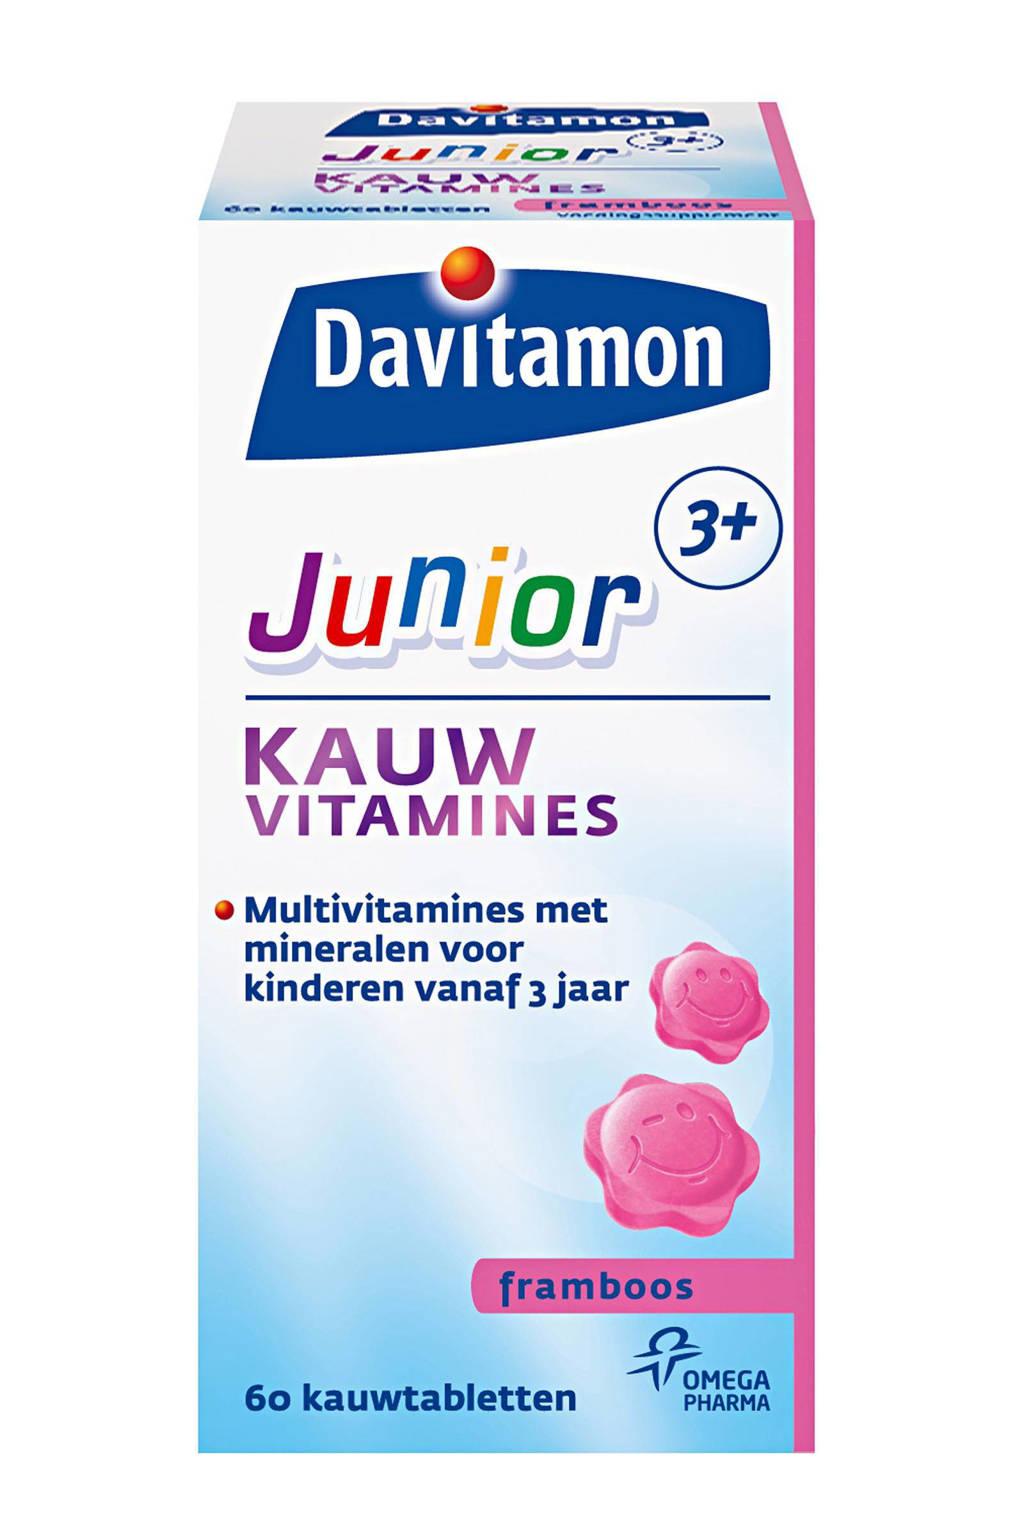 Davitamon Junior 3+ framboos 60 kauwtabletten, 60 stuks, Framboos